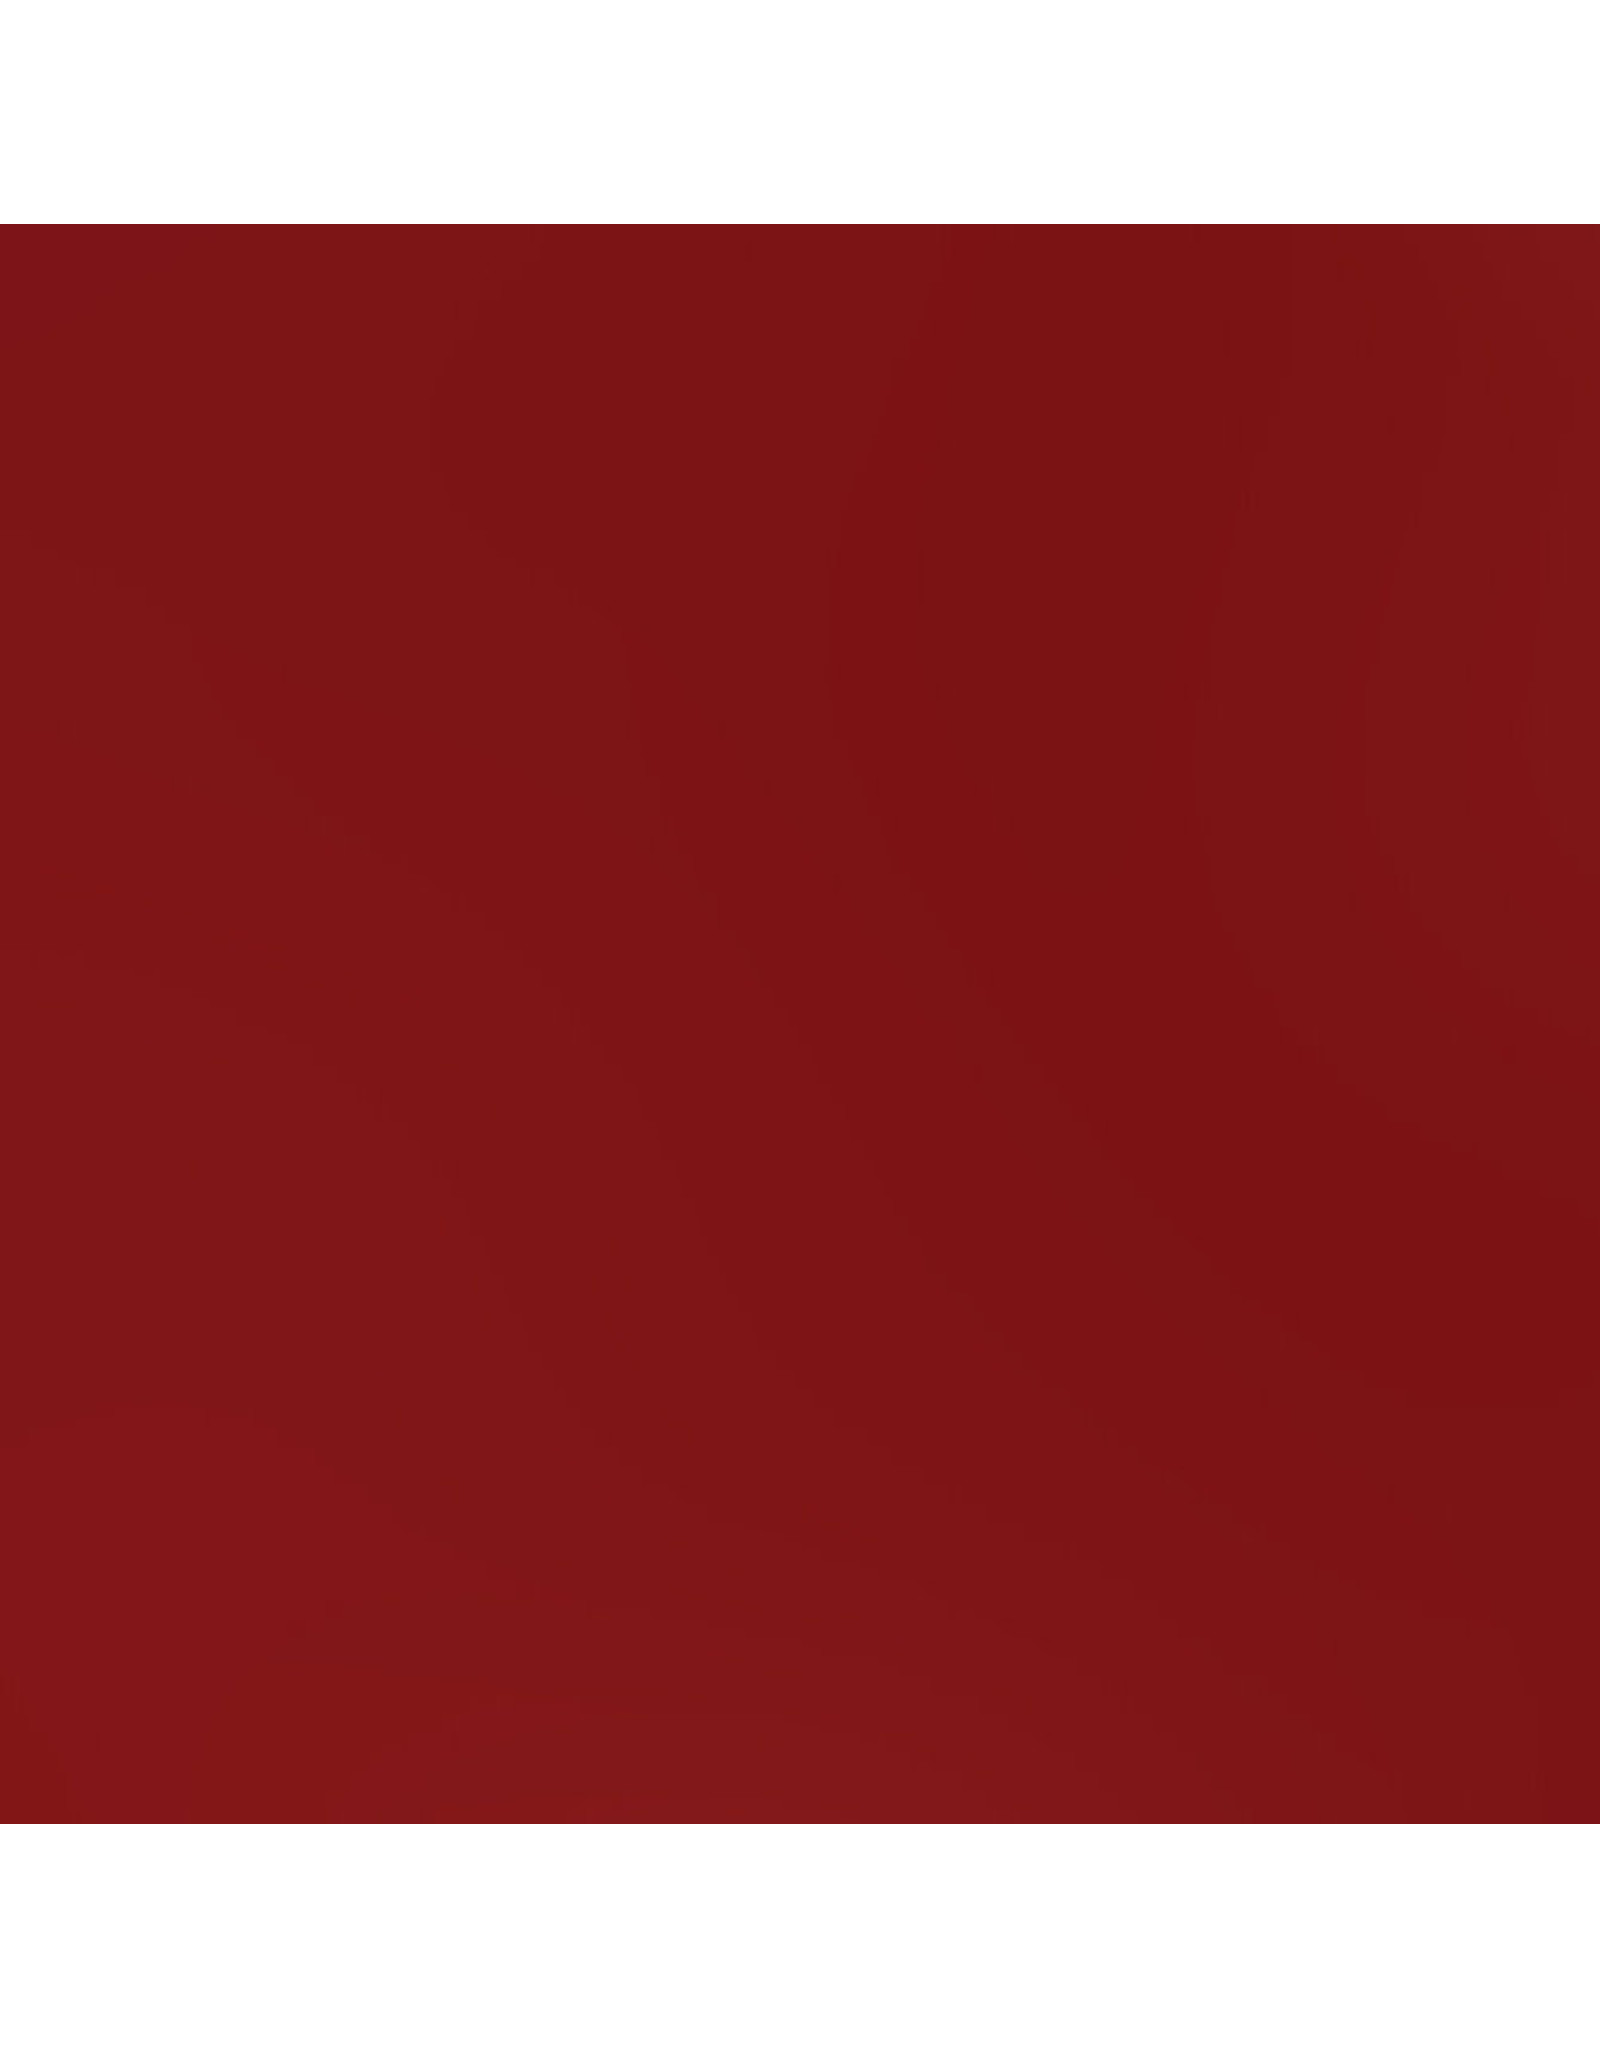 Bazzill Bazzill Card Shoppe 8.5x11 -  Red Hots